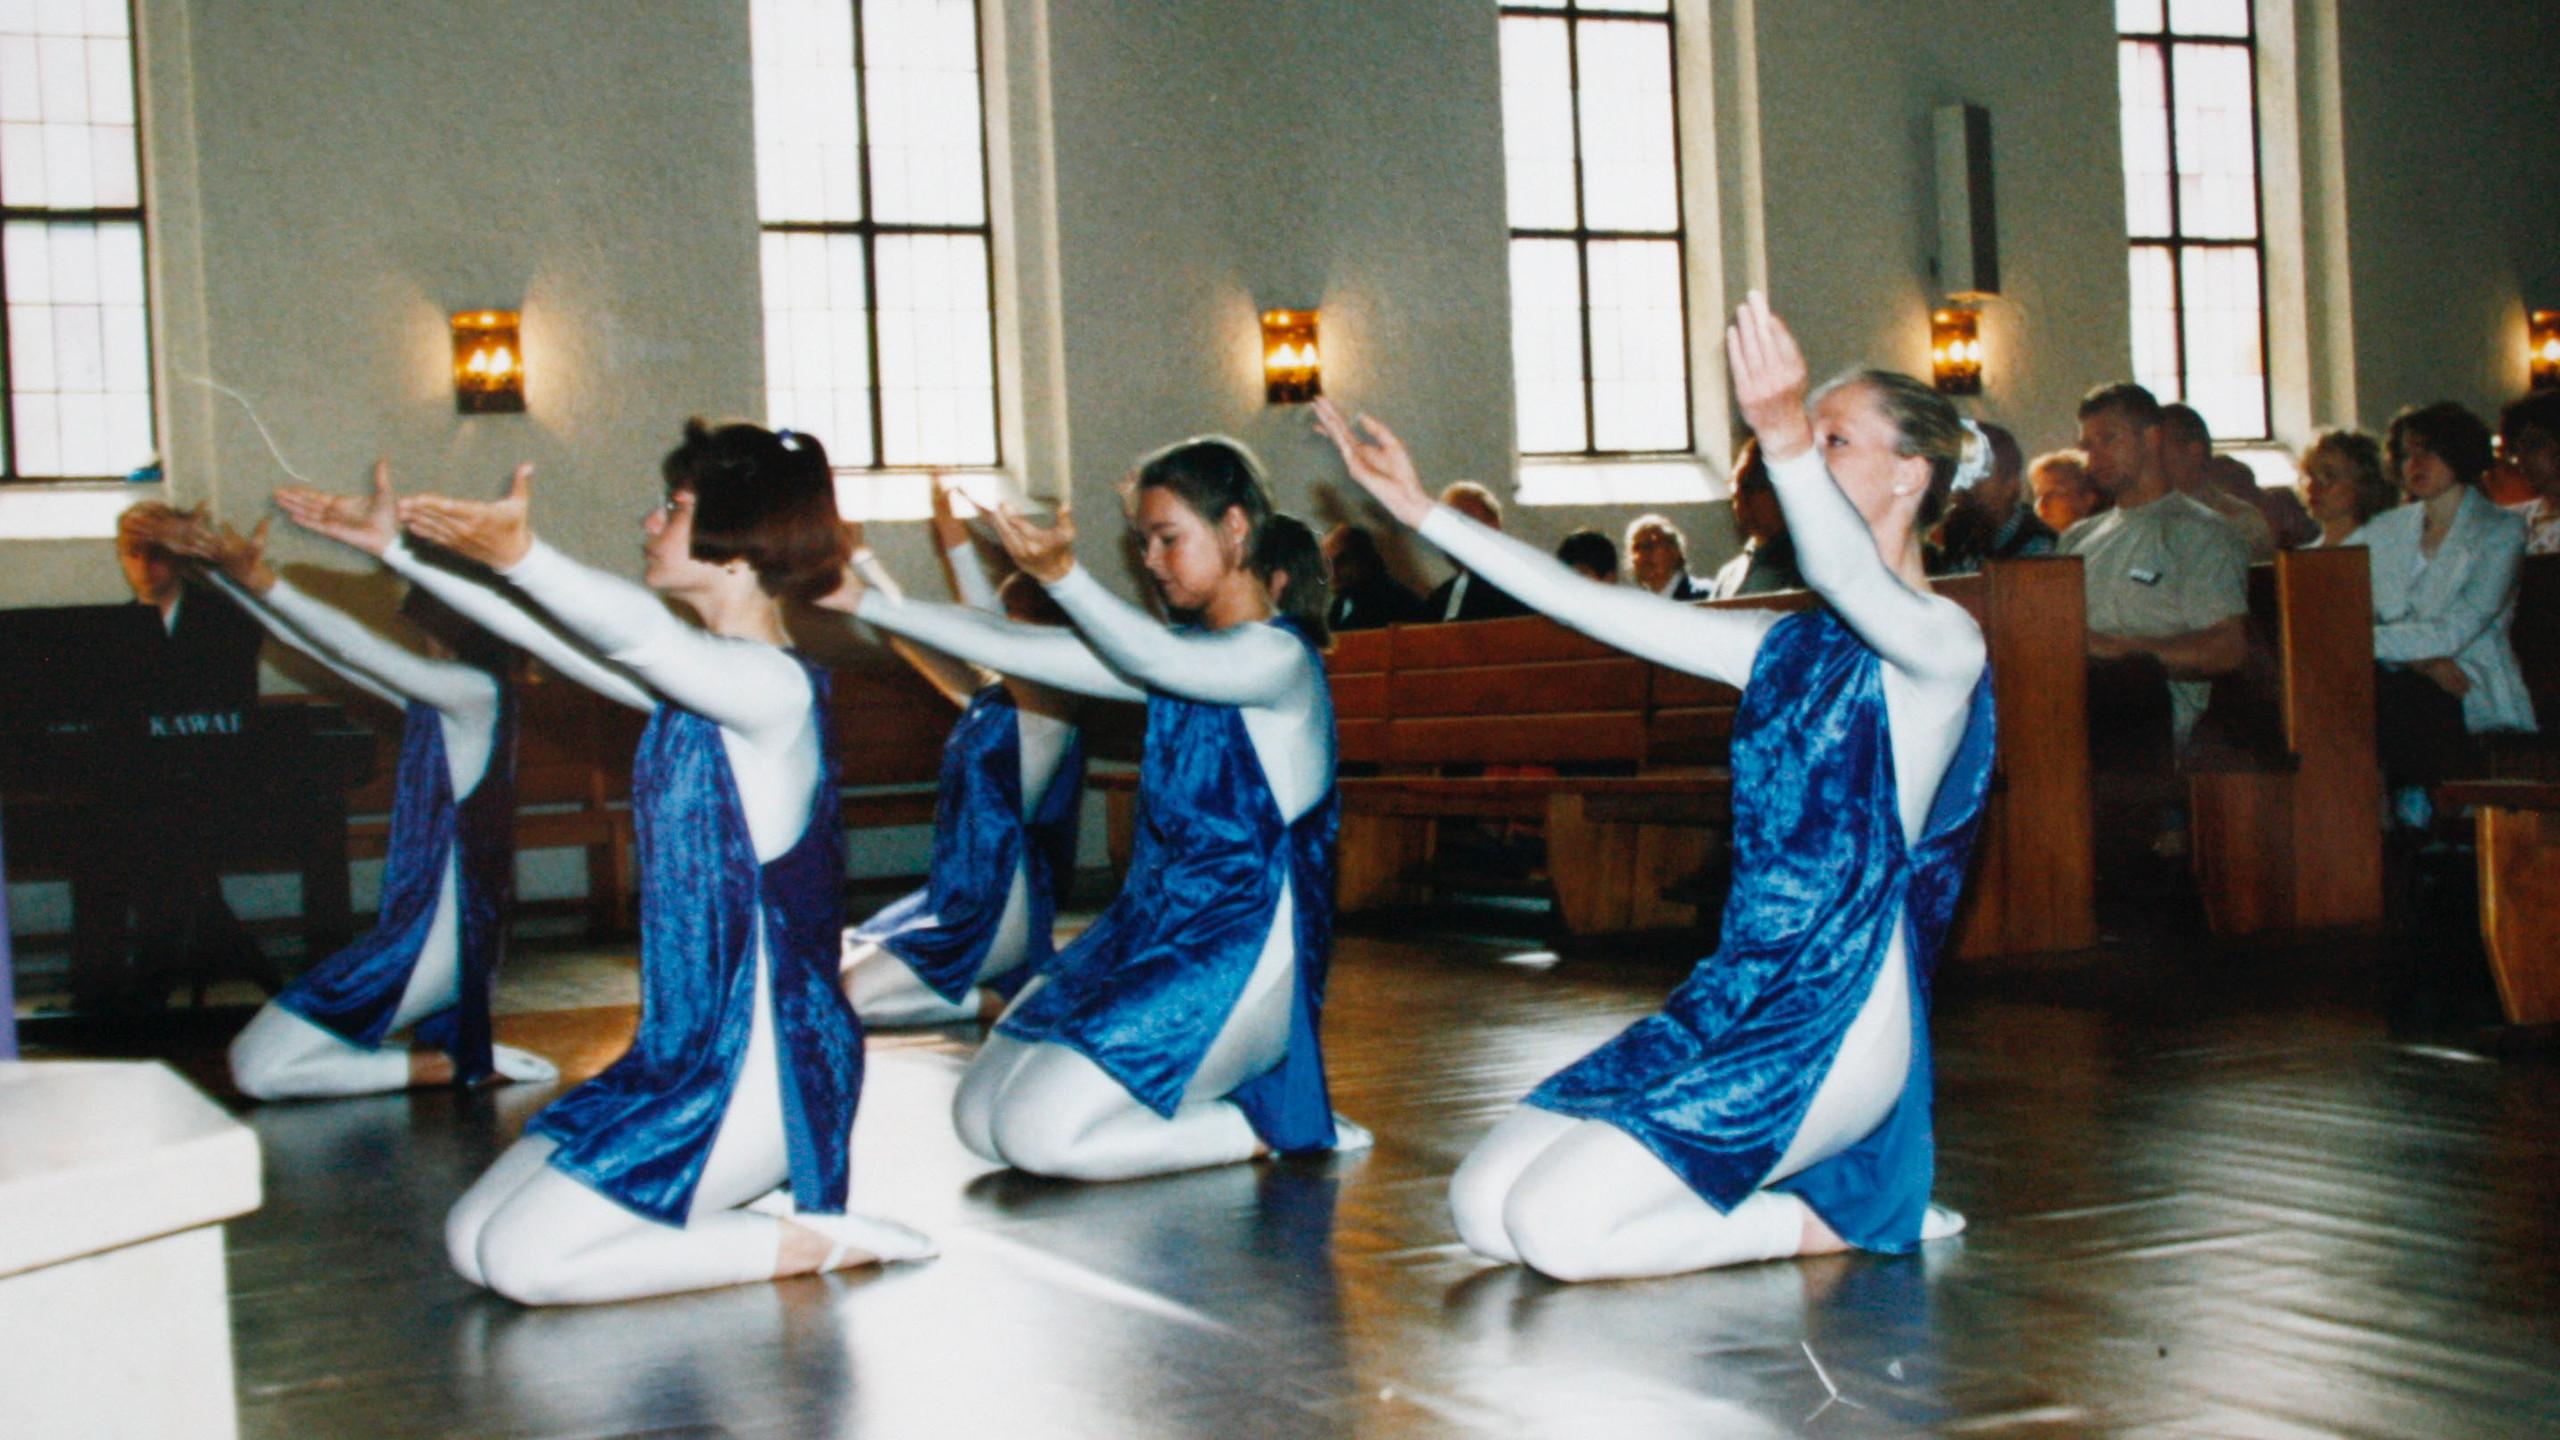 Das Tanz-Experiment in der Emmaus-Kirche